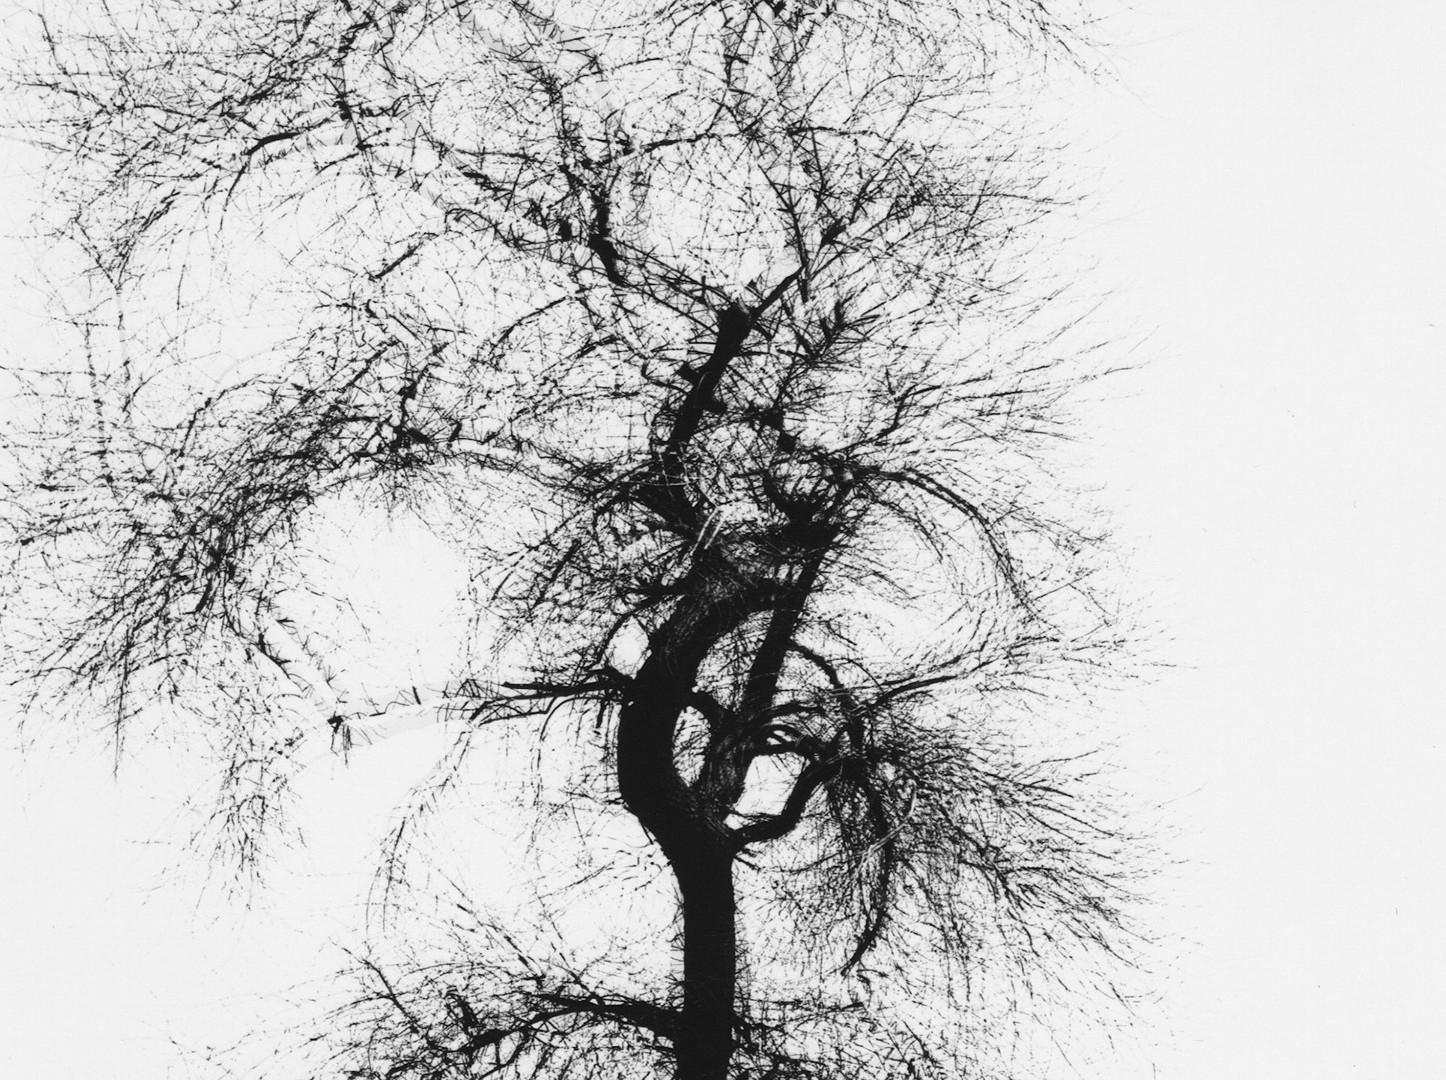 Harry Callahan, Multiple Exposure Tree, Chicago, 1956